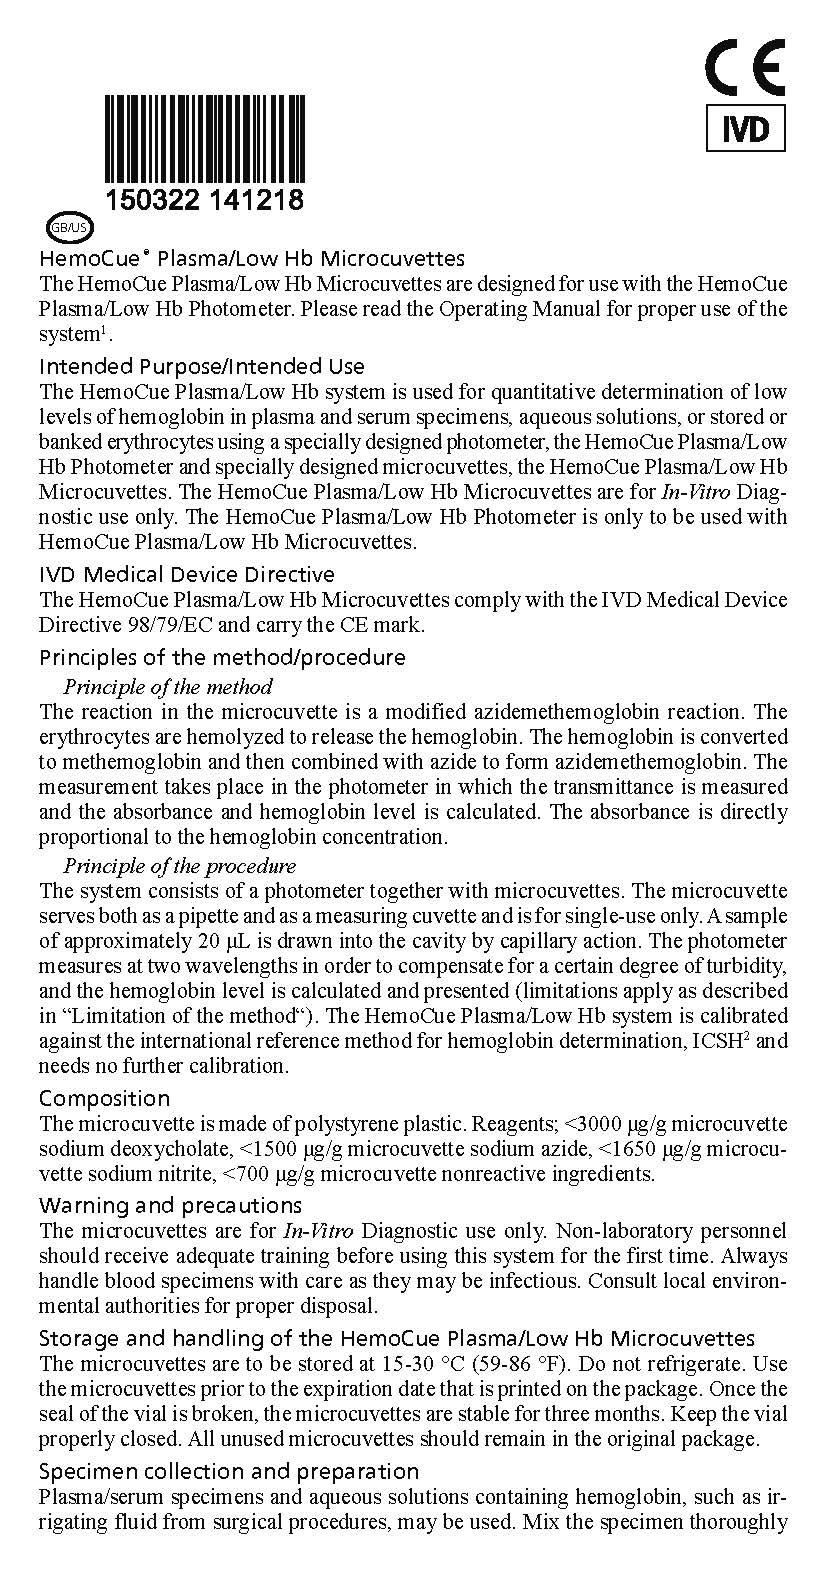 HemoCue Plasma/Low Product Insert